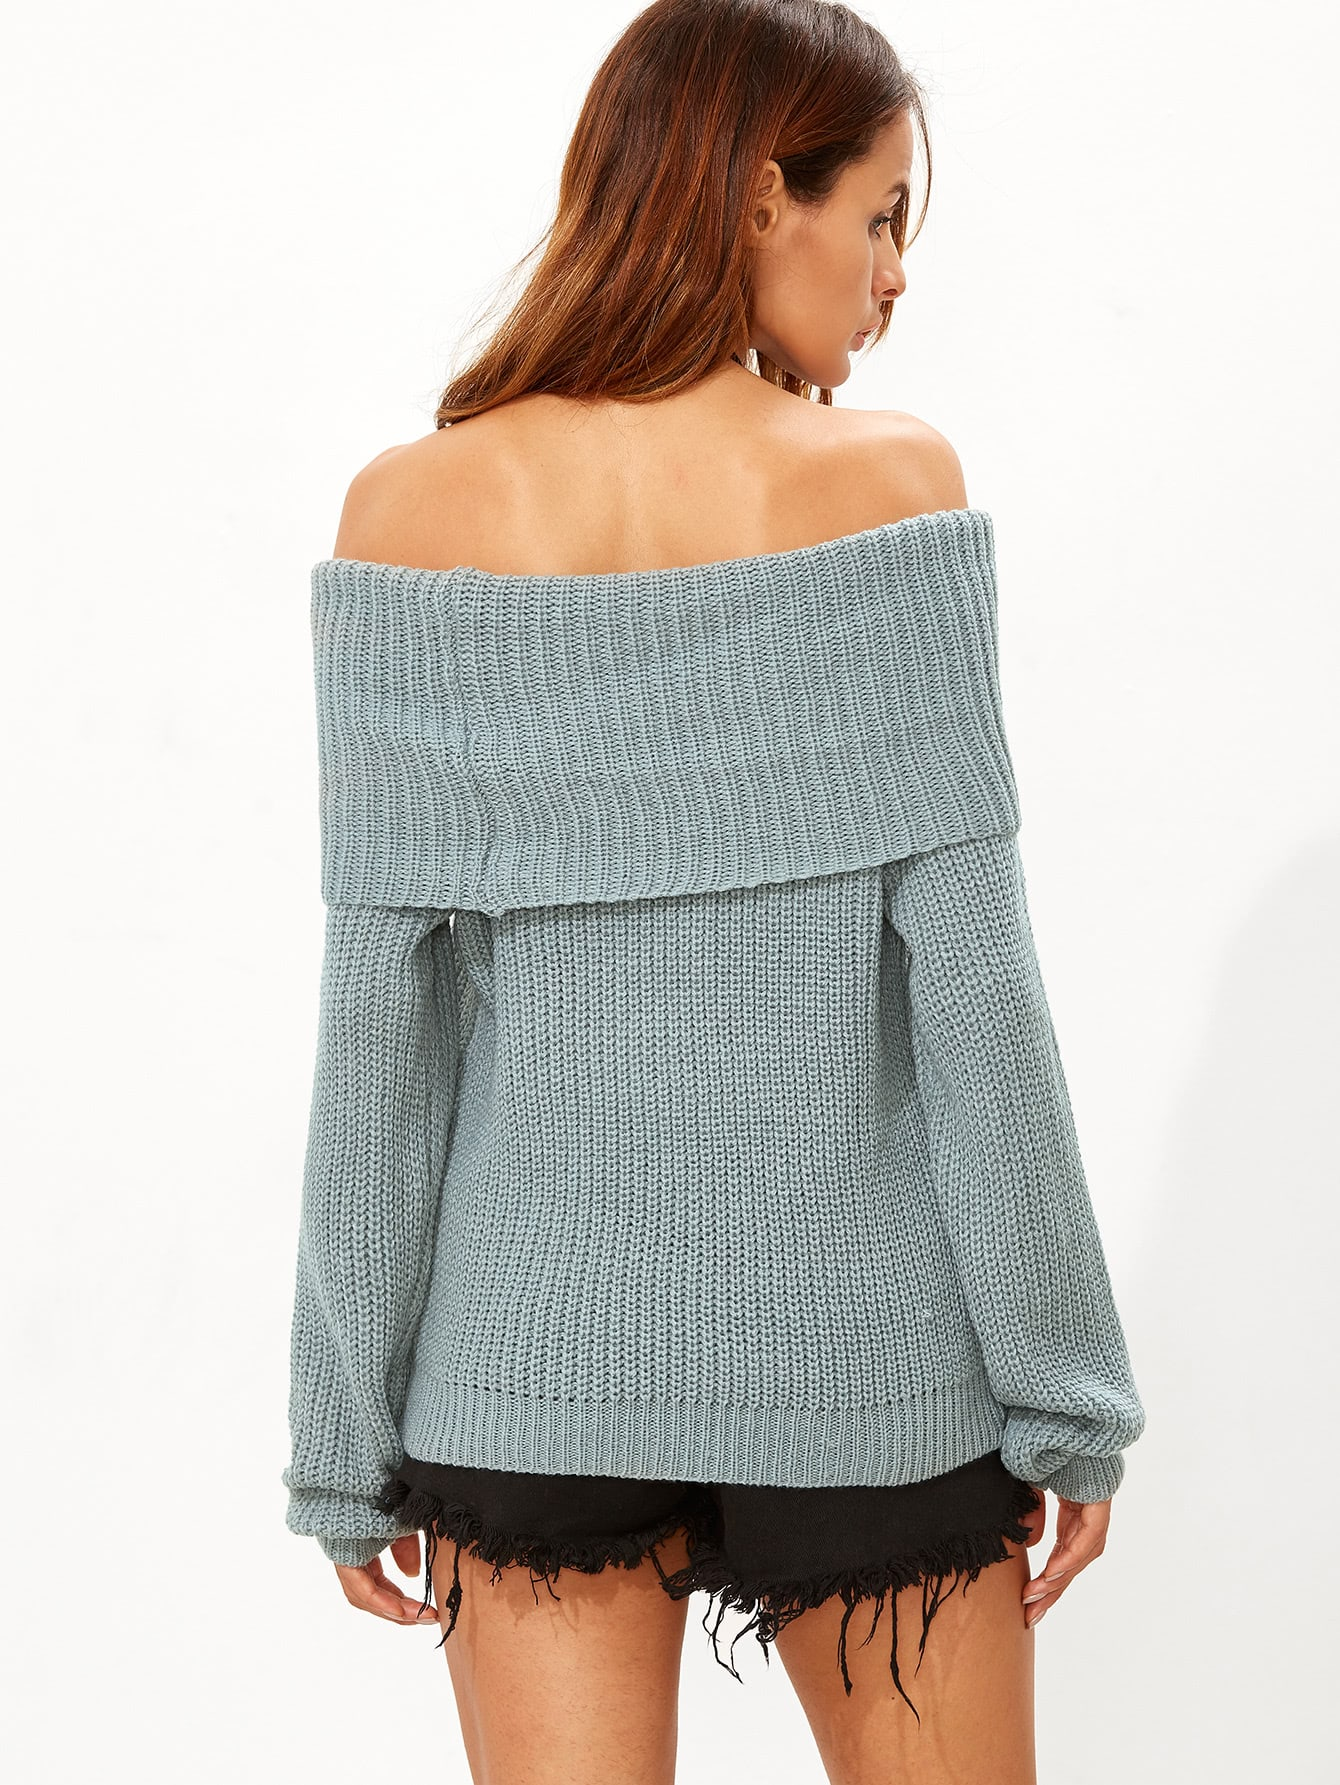 sweater160909462_2